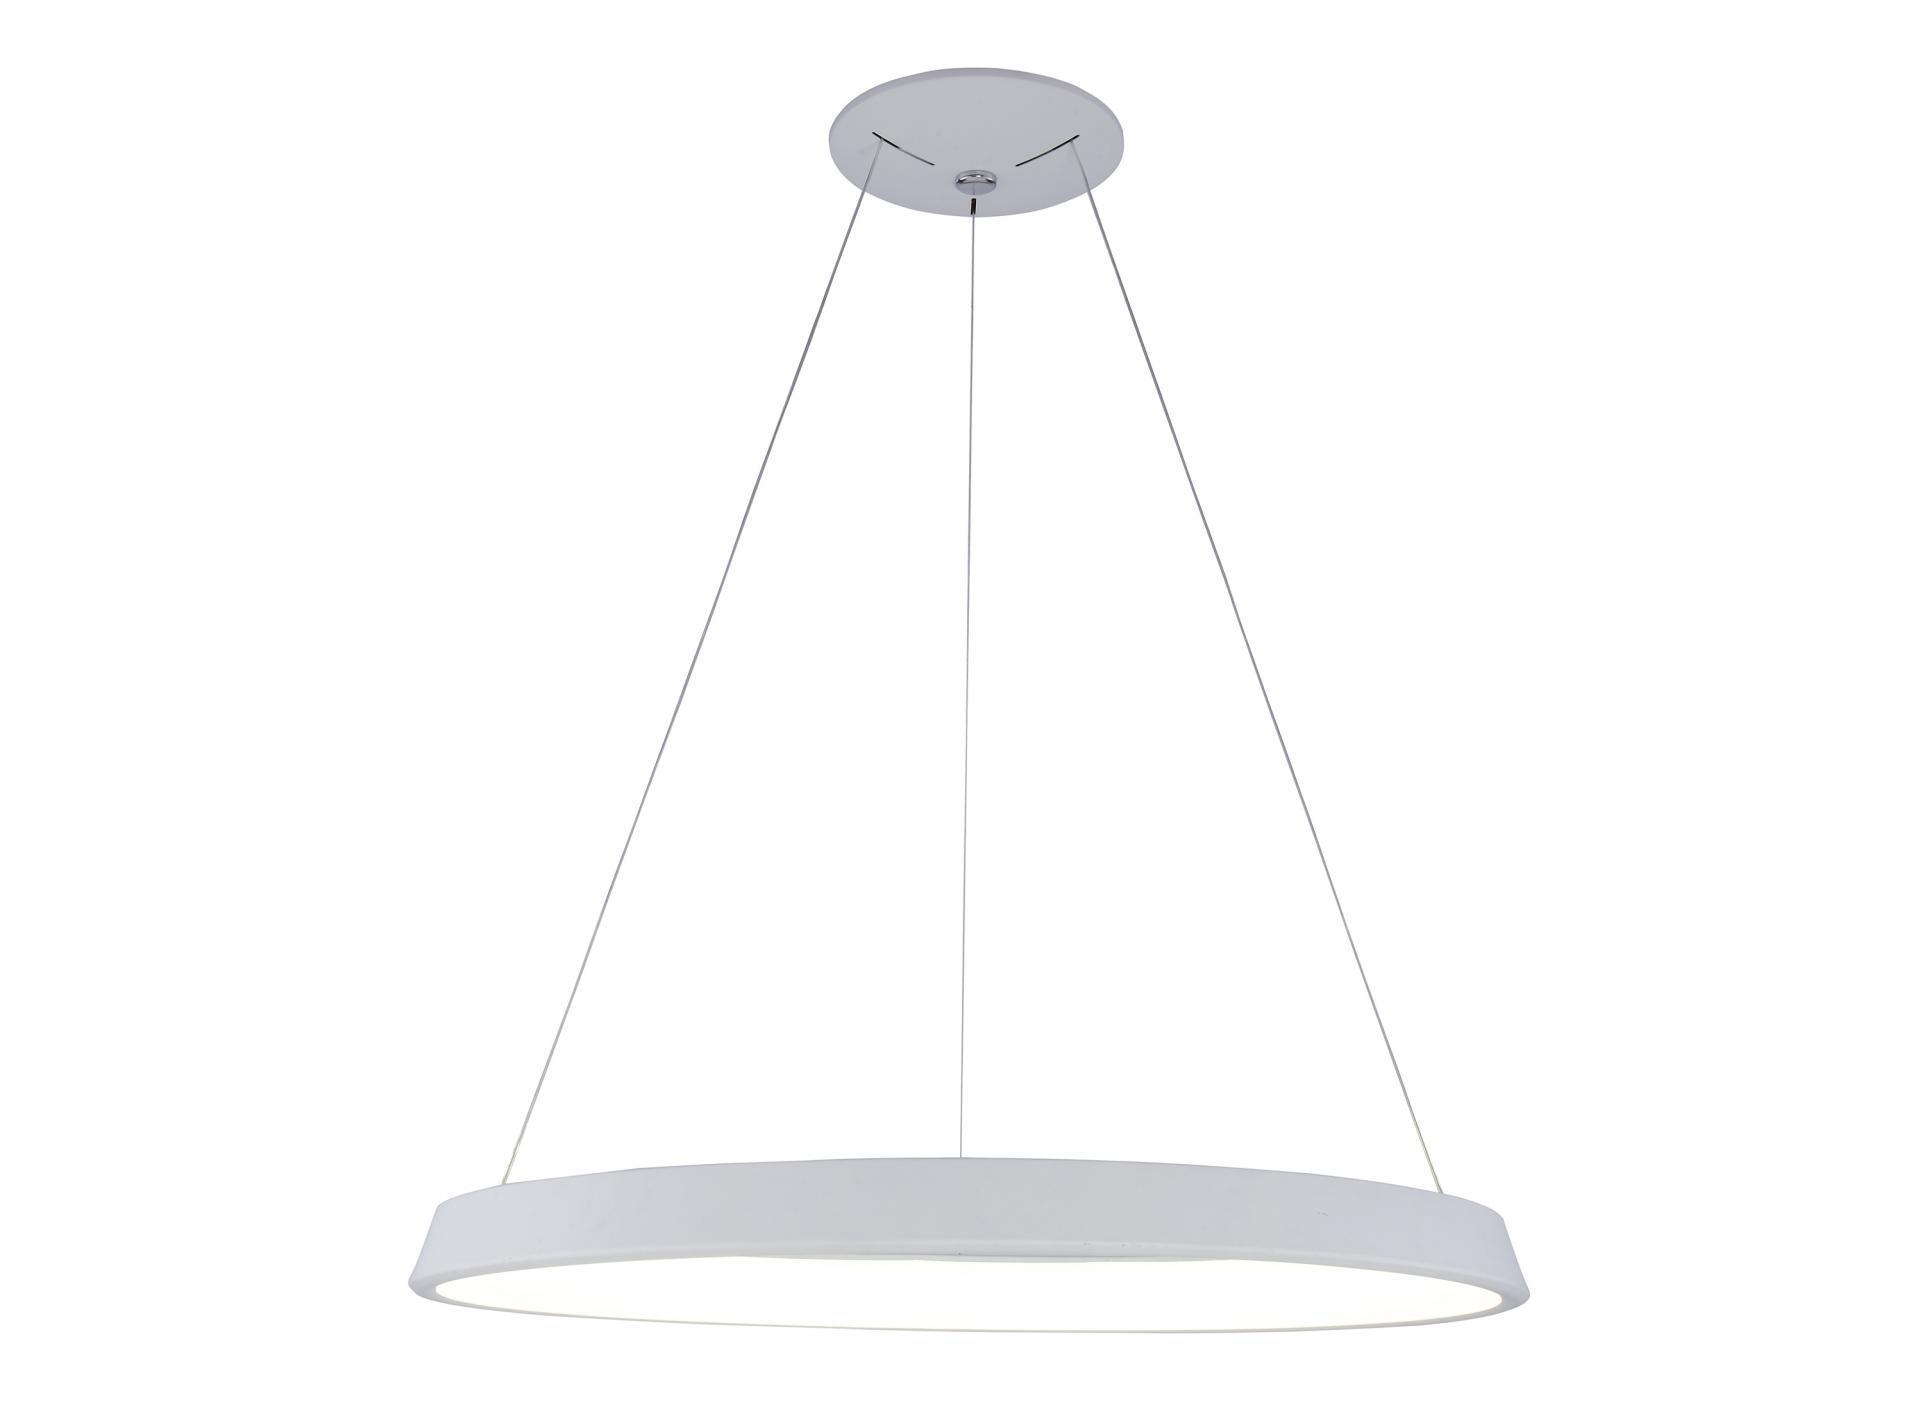 LAMPARA DE TECHO LED COLGANTE 42W 3000K 180º 230V BLANCO